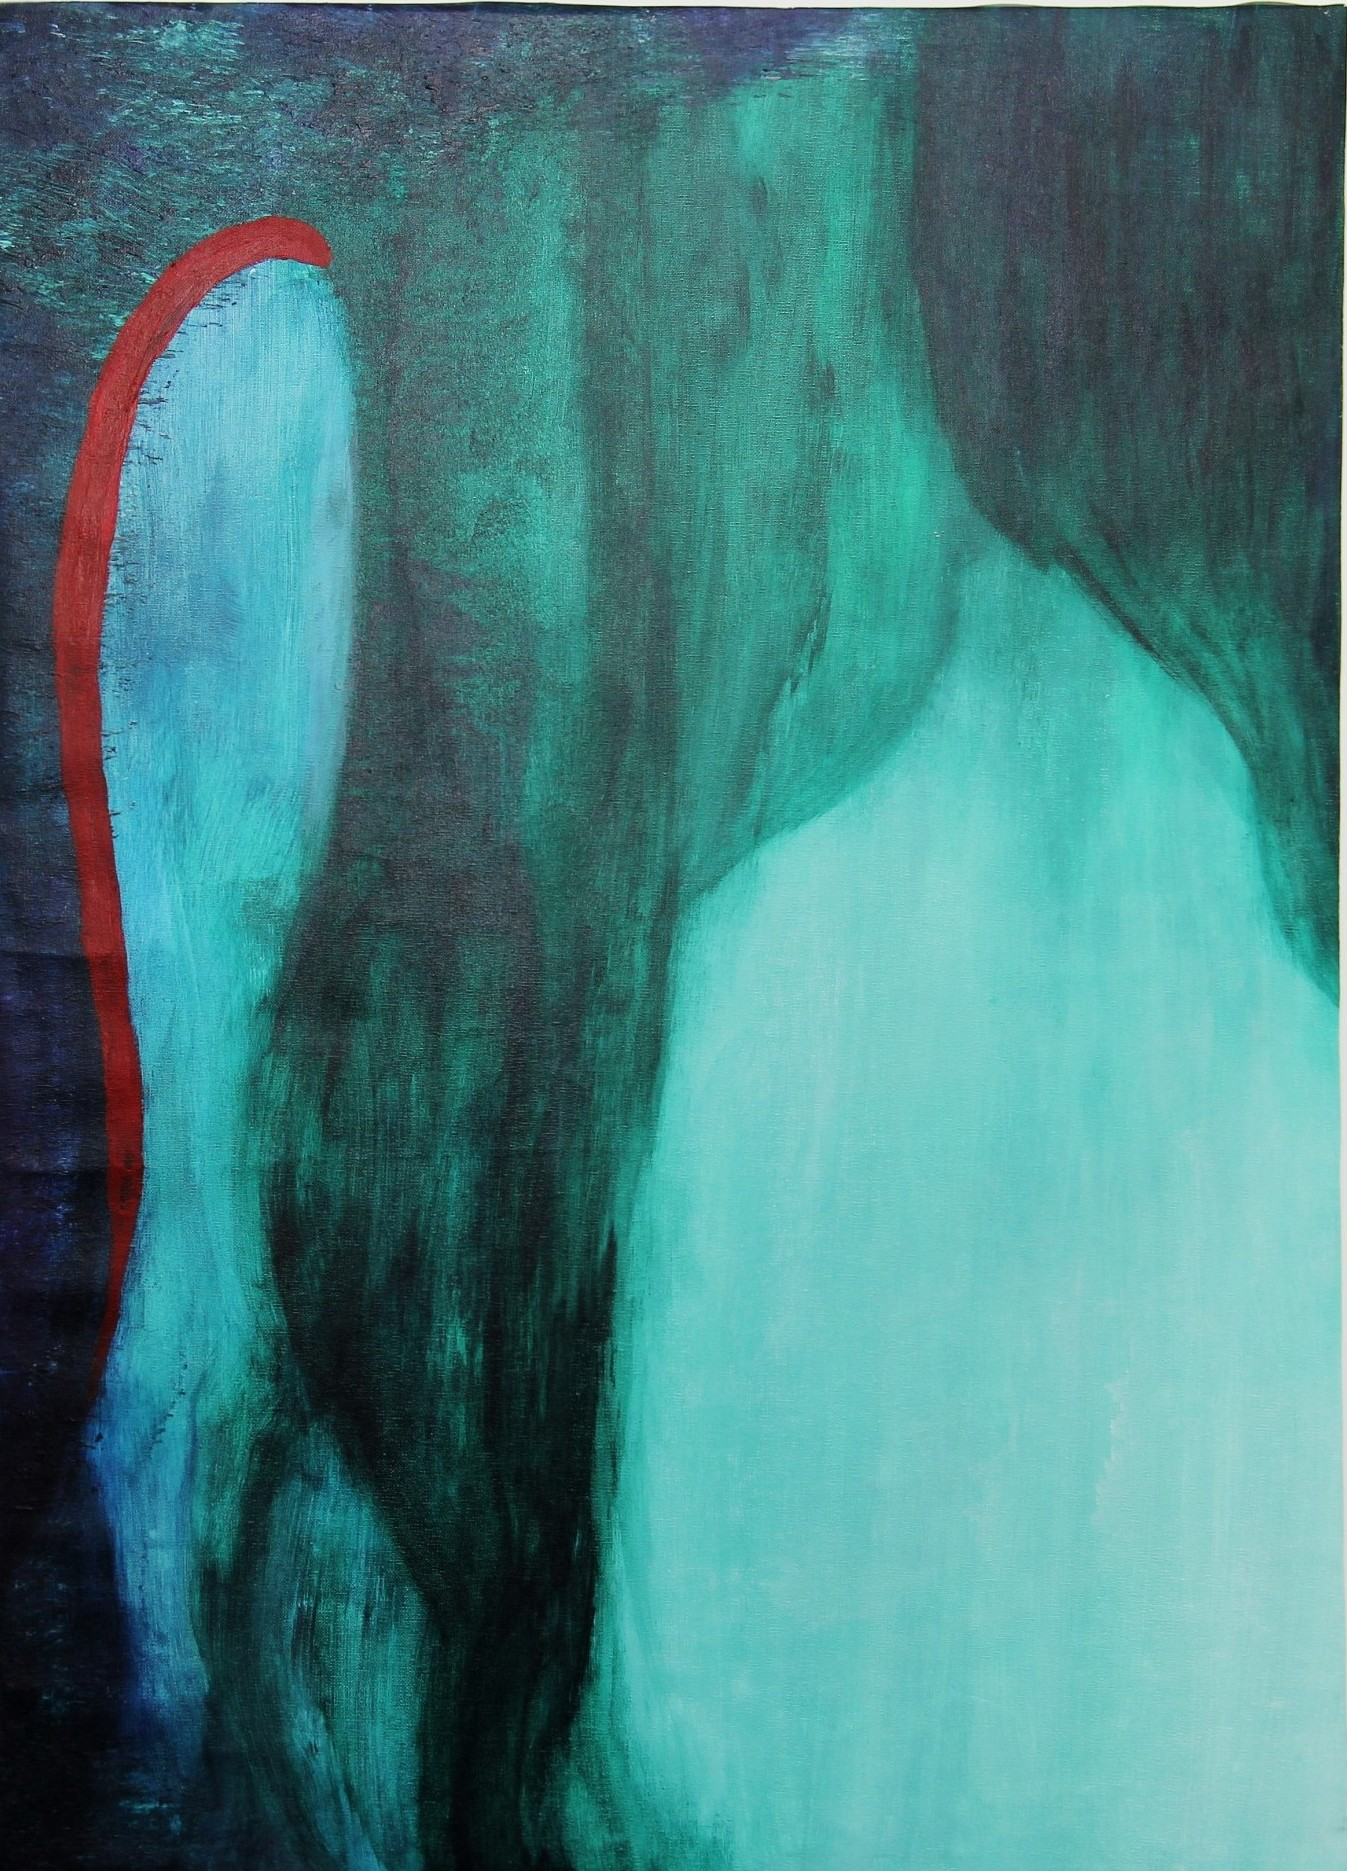 Kerstin Carolin Beyer, Painting, Kunst, Acrilic, colors, Malerei, Women, painting, Acrilic,